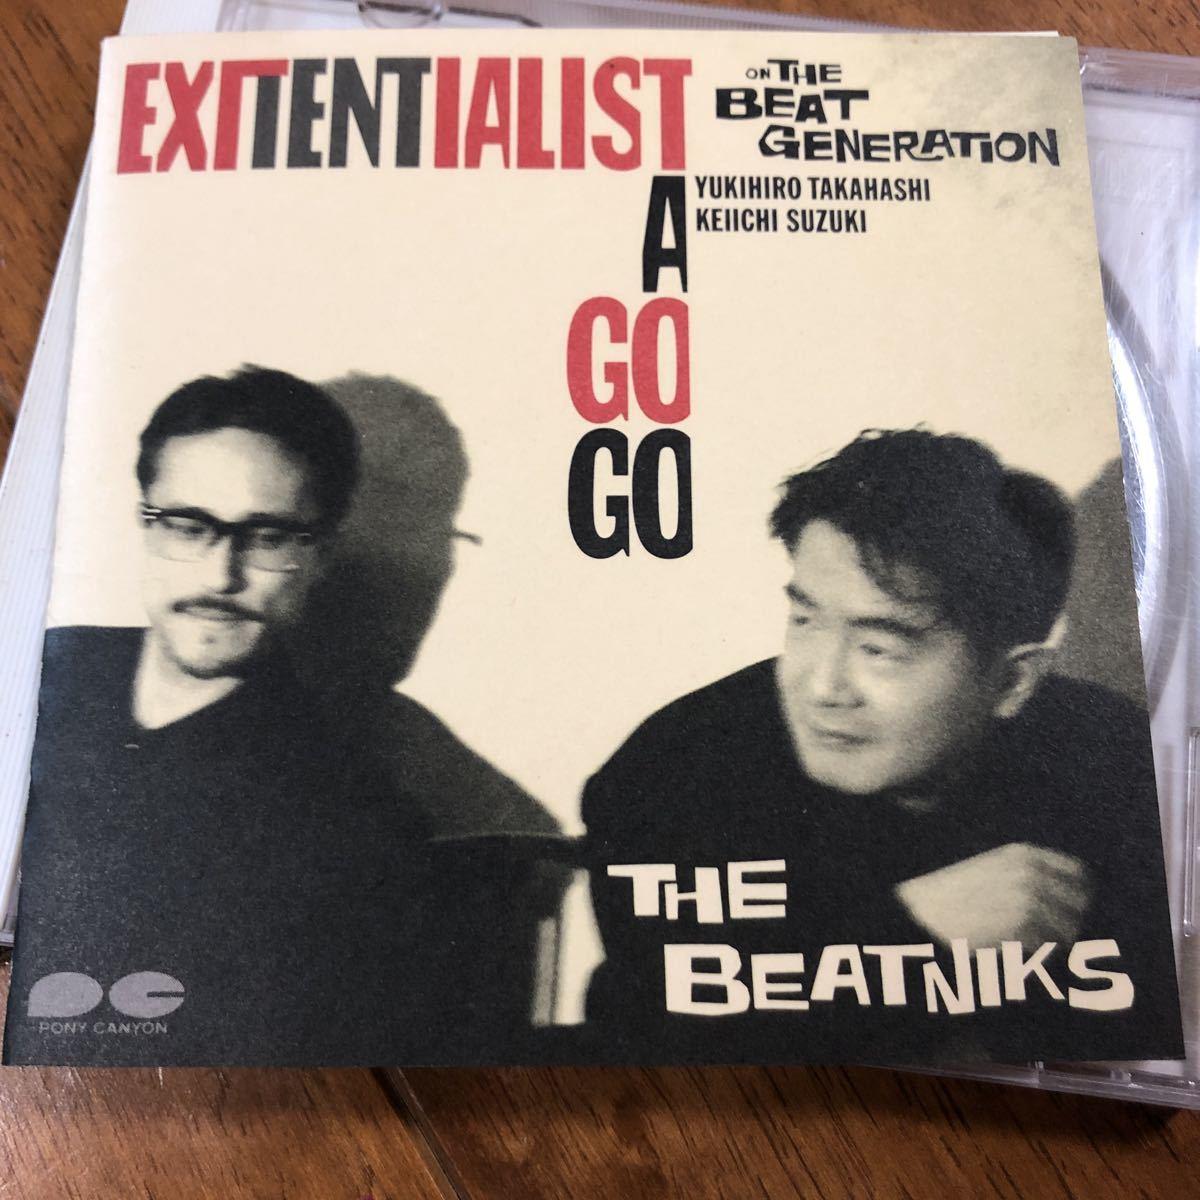 THE BEATNIKS ザ・ビートニクス(高橋幸宏/鈴木慶一)  EXITENTIALIST A GO GO  ビートで行こう_画像1